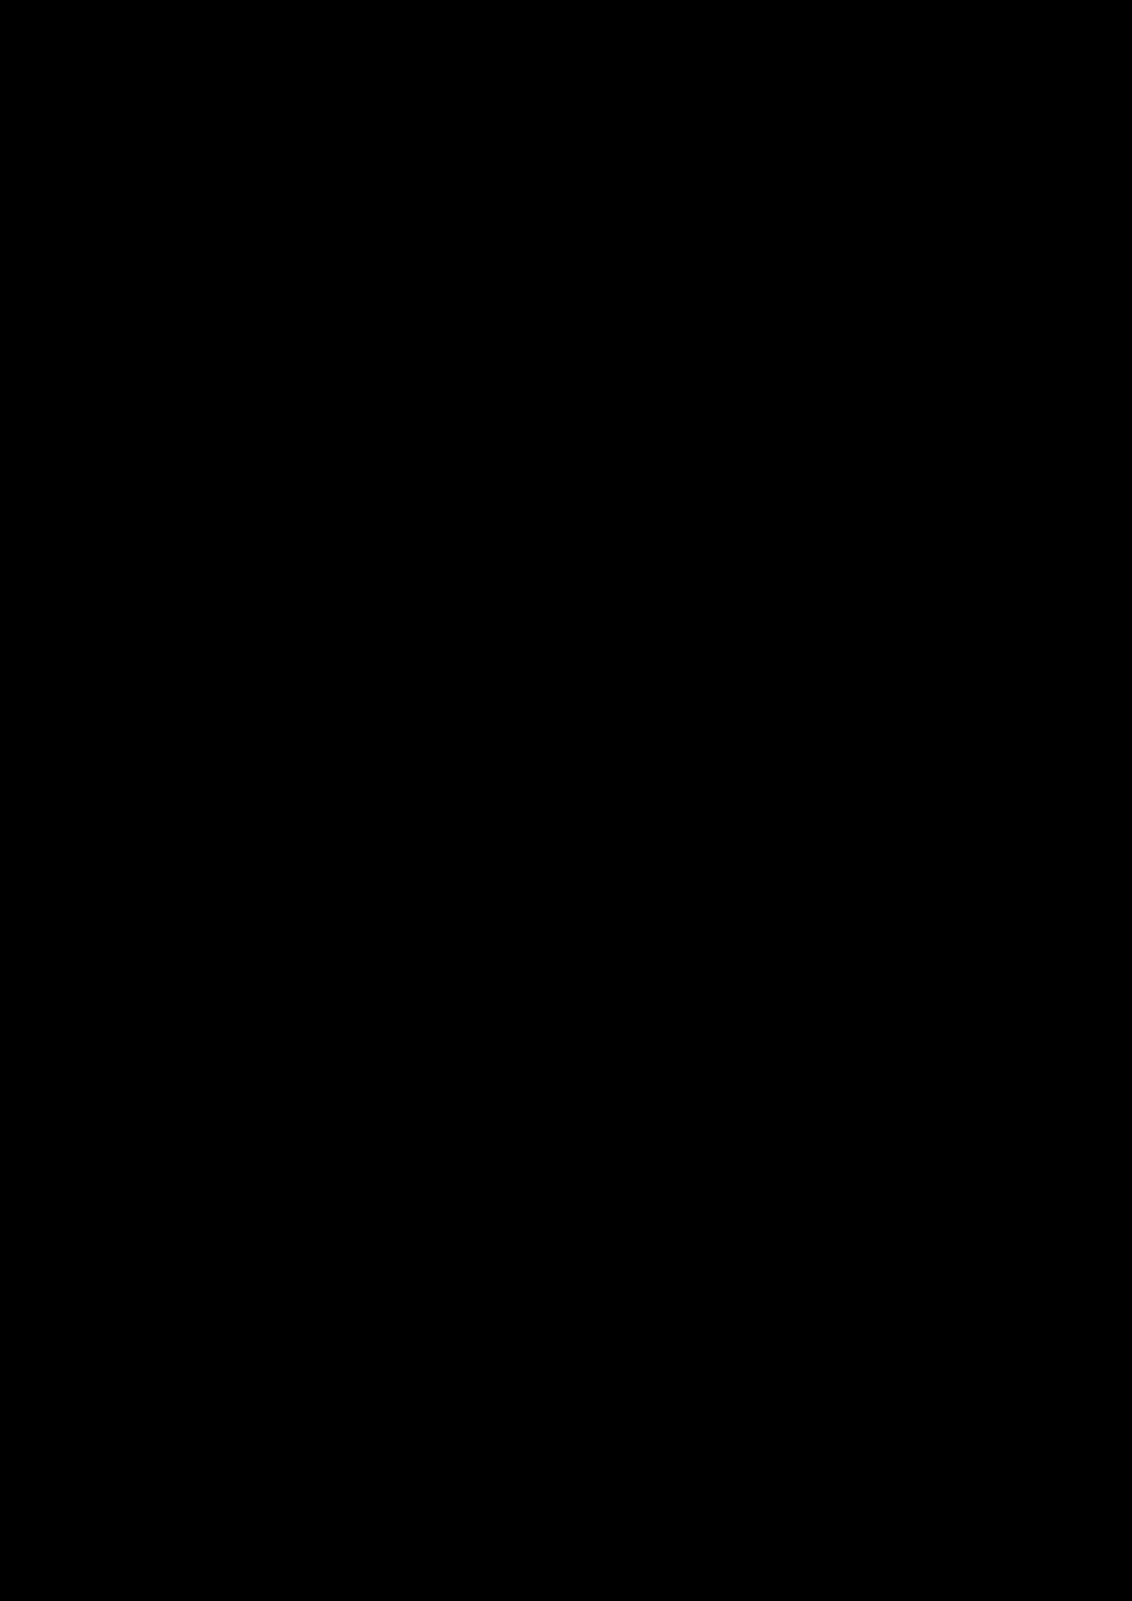 Korolevstvo slez slide, Image 26